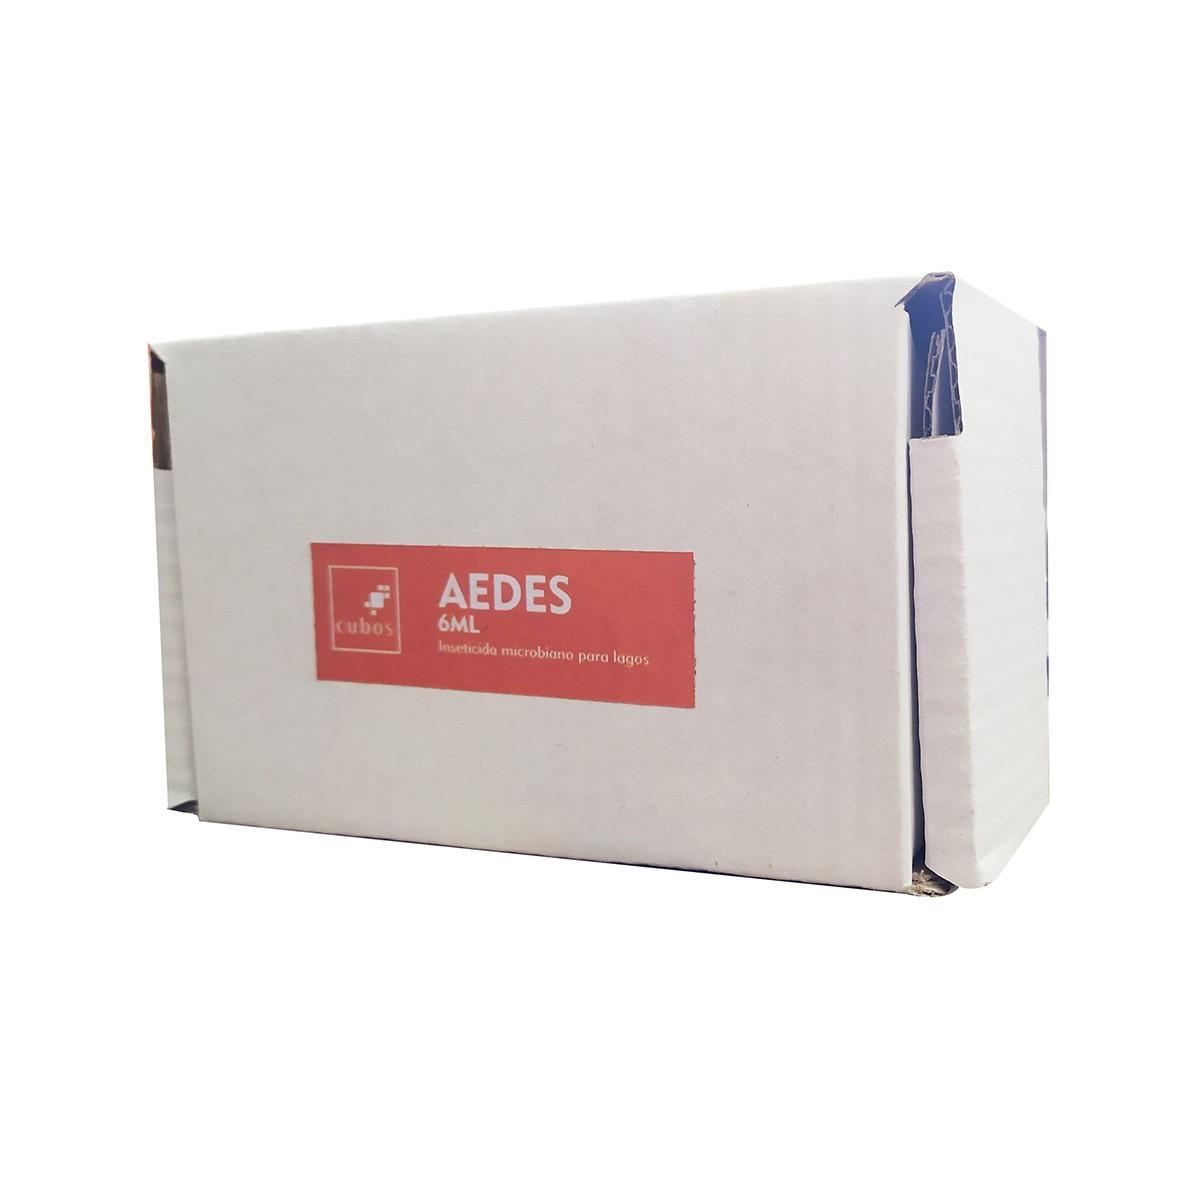 Refil Inseticida Biológico para Lagos Cubos Aedes  - 6ml